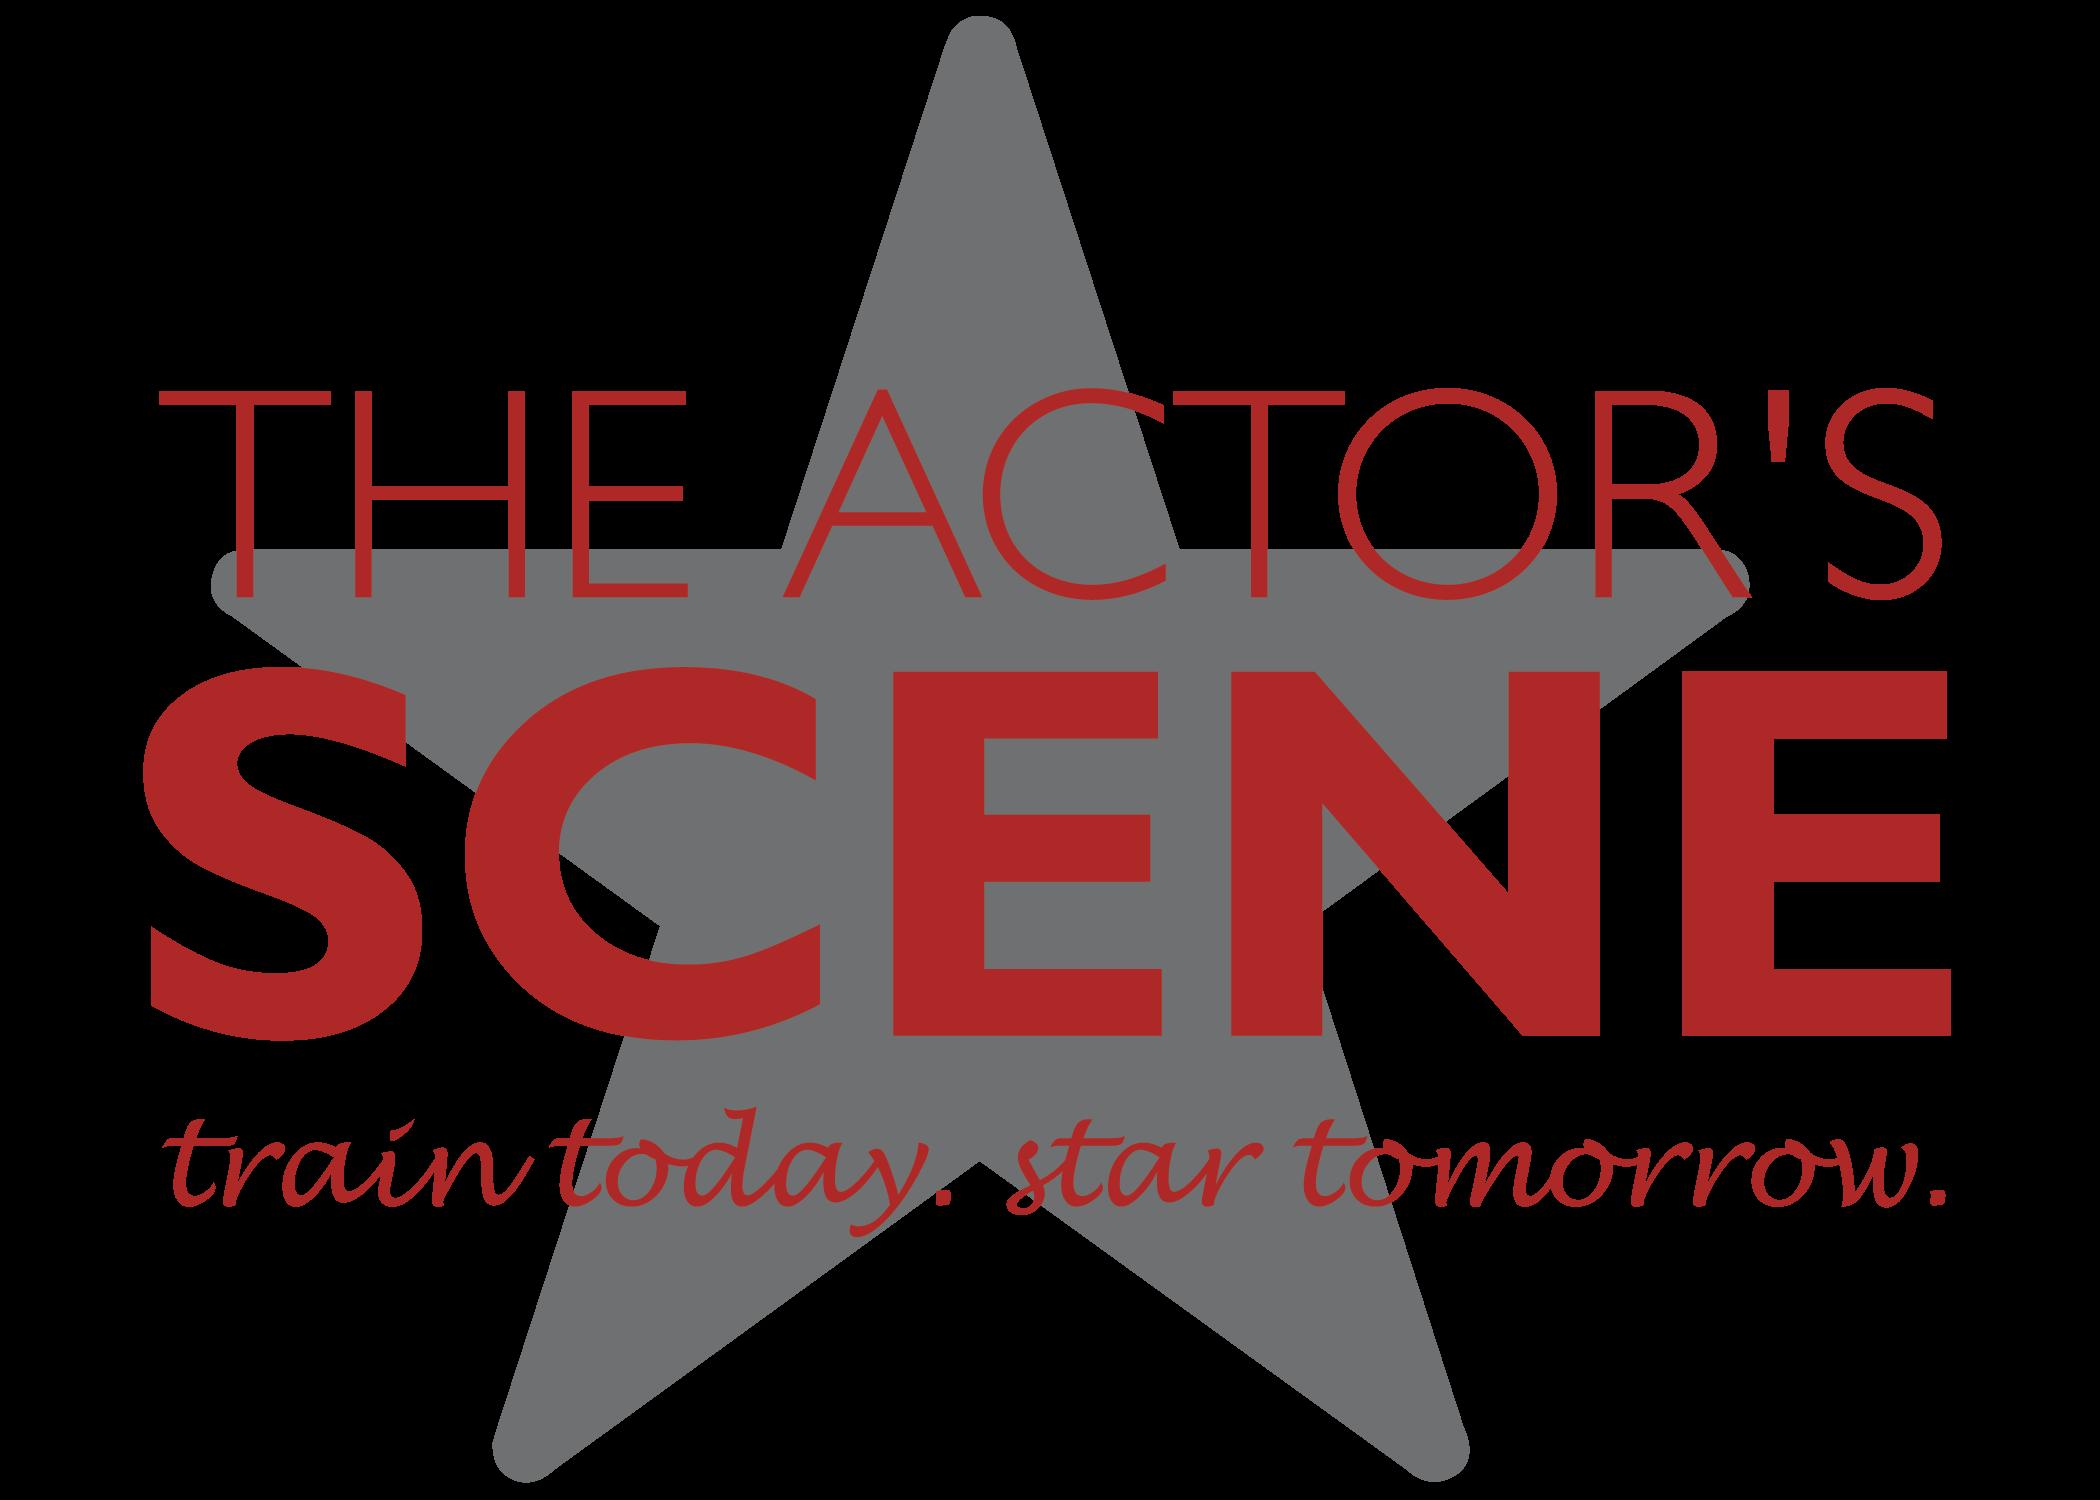 The Actor's Scene